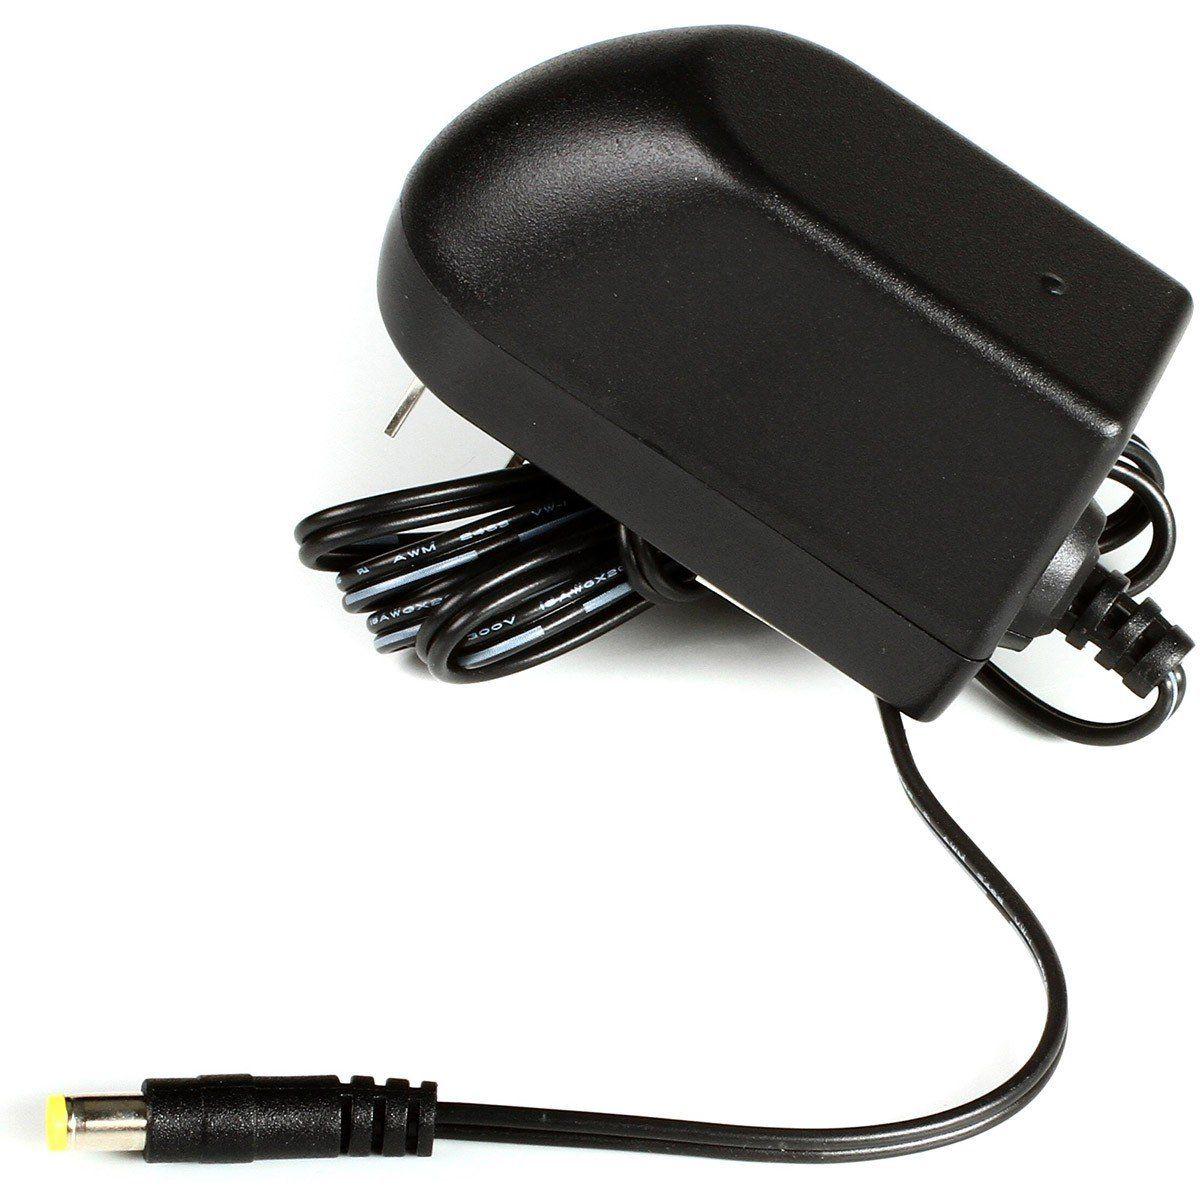 Numark NV Controladora DJ 4-Decks 4-Canais Display LCD Usb Serato DJ